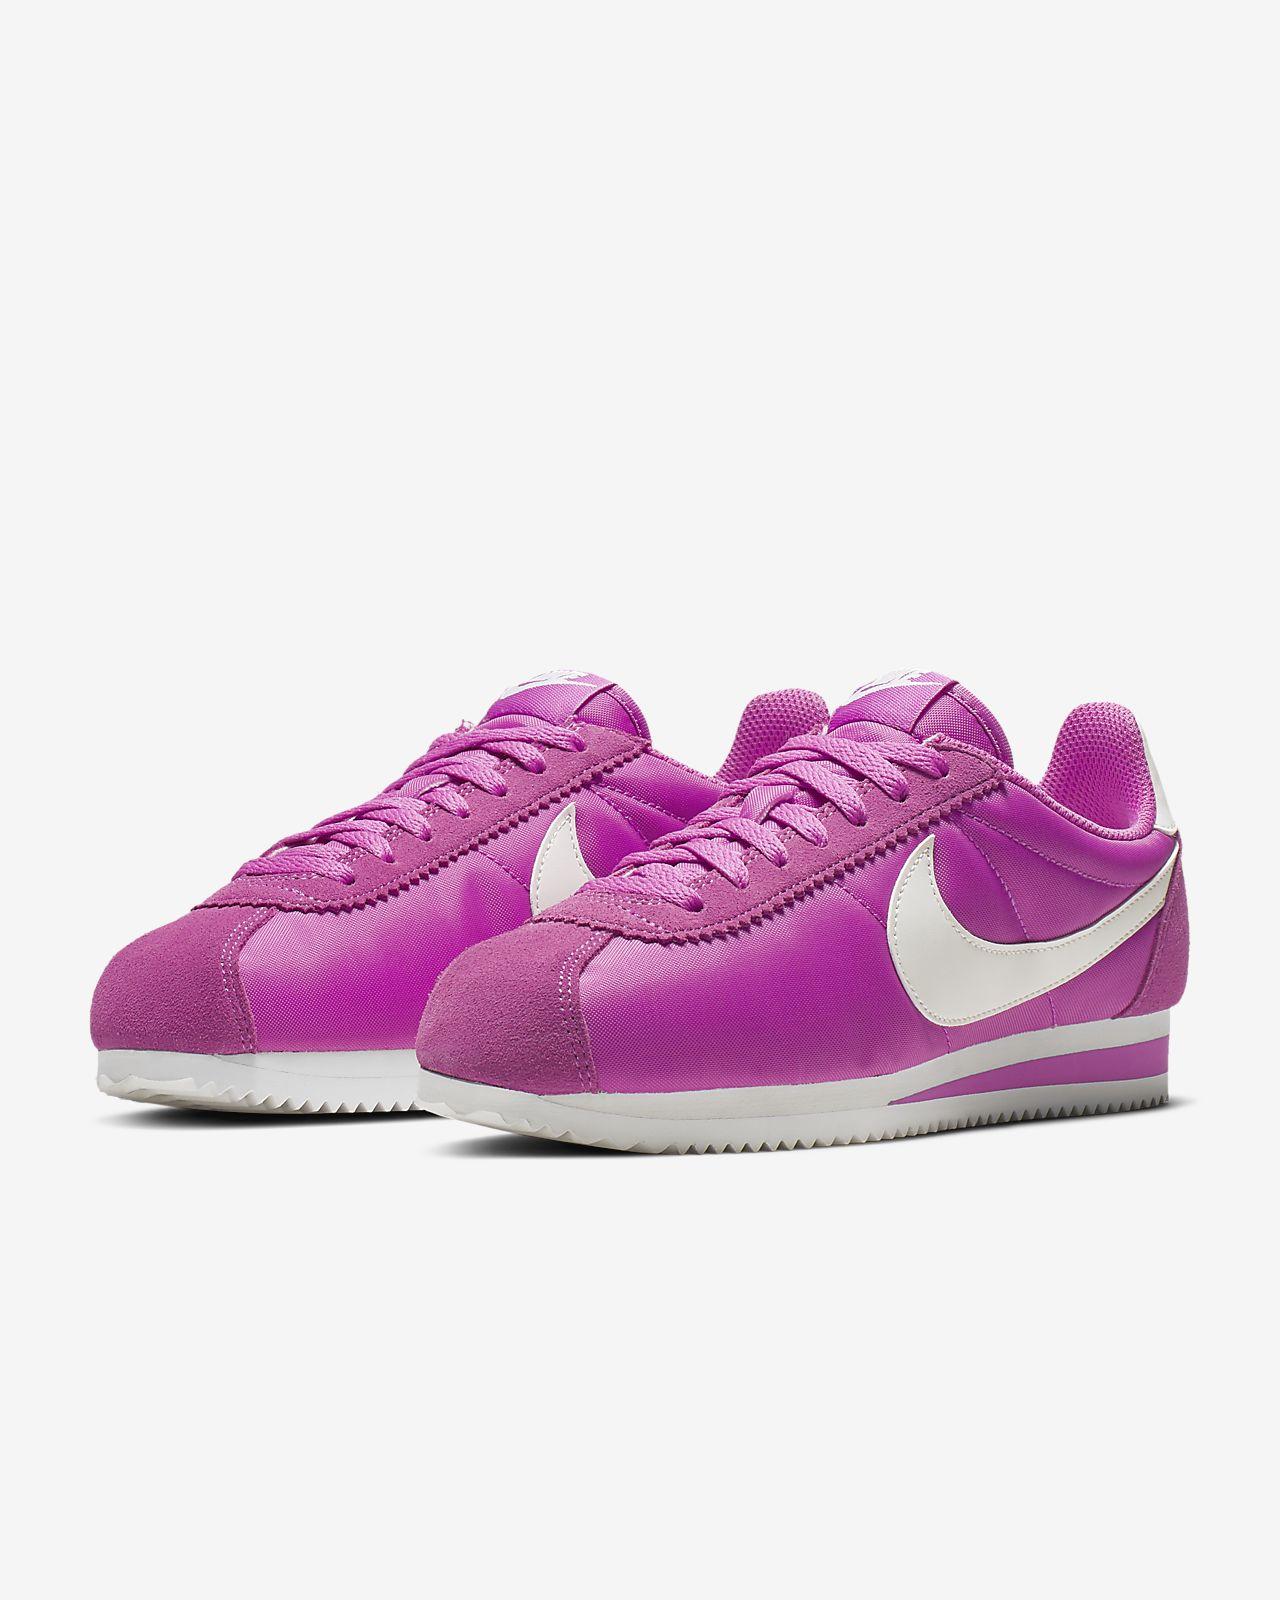 innovative design 8d7a9 cf0d4 Nike Classic Cortez Nylon Women's Shoe. Nike.com ID